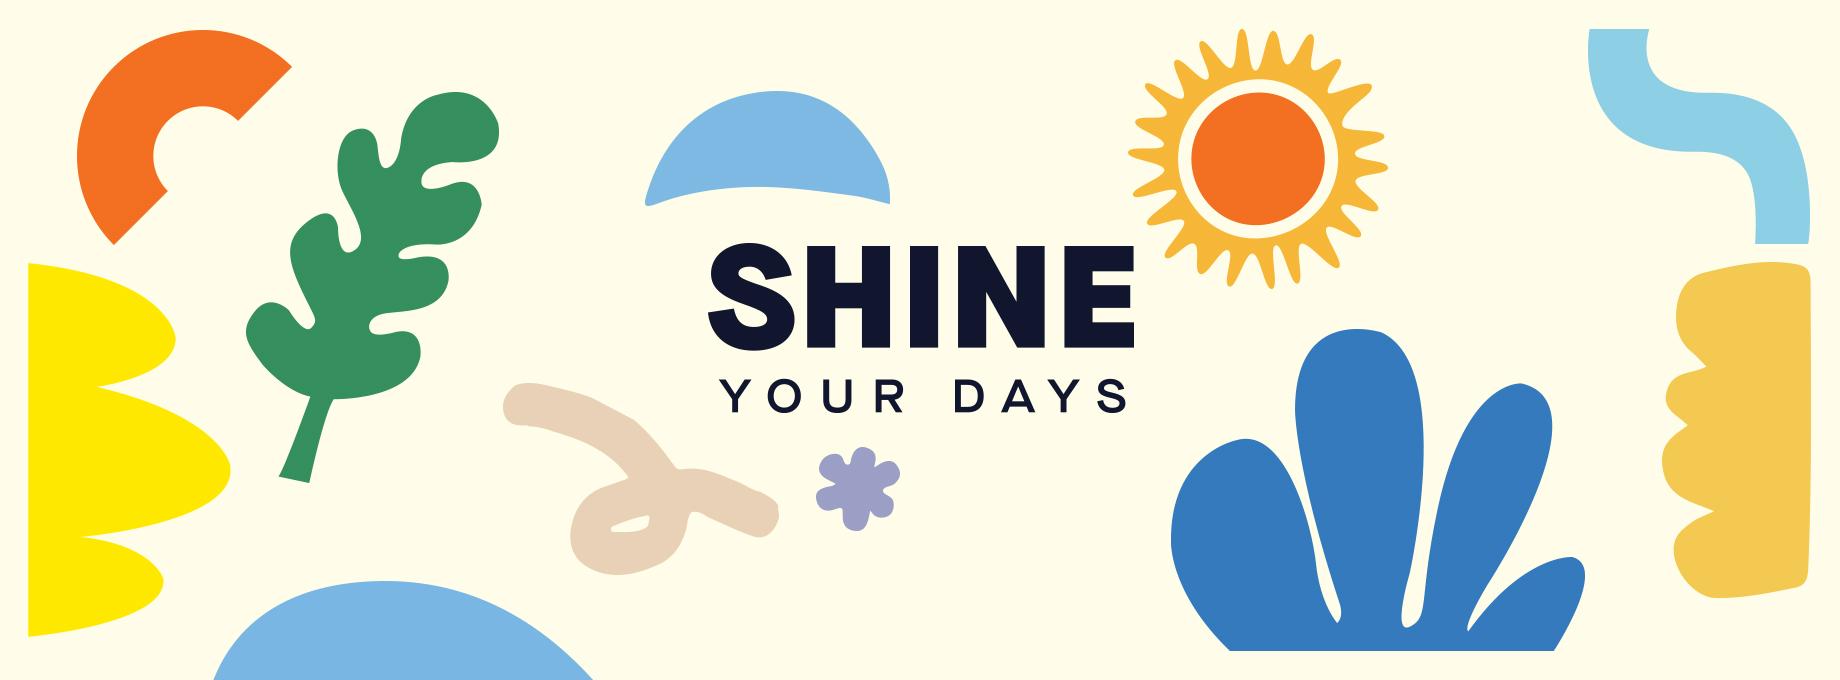 SHINE YOUR DAYS